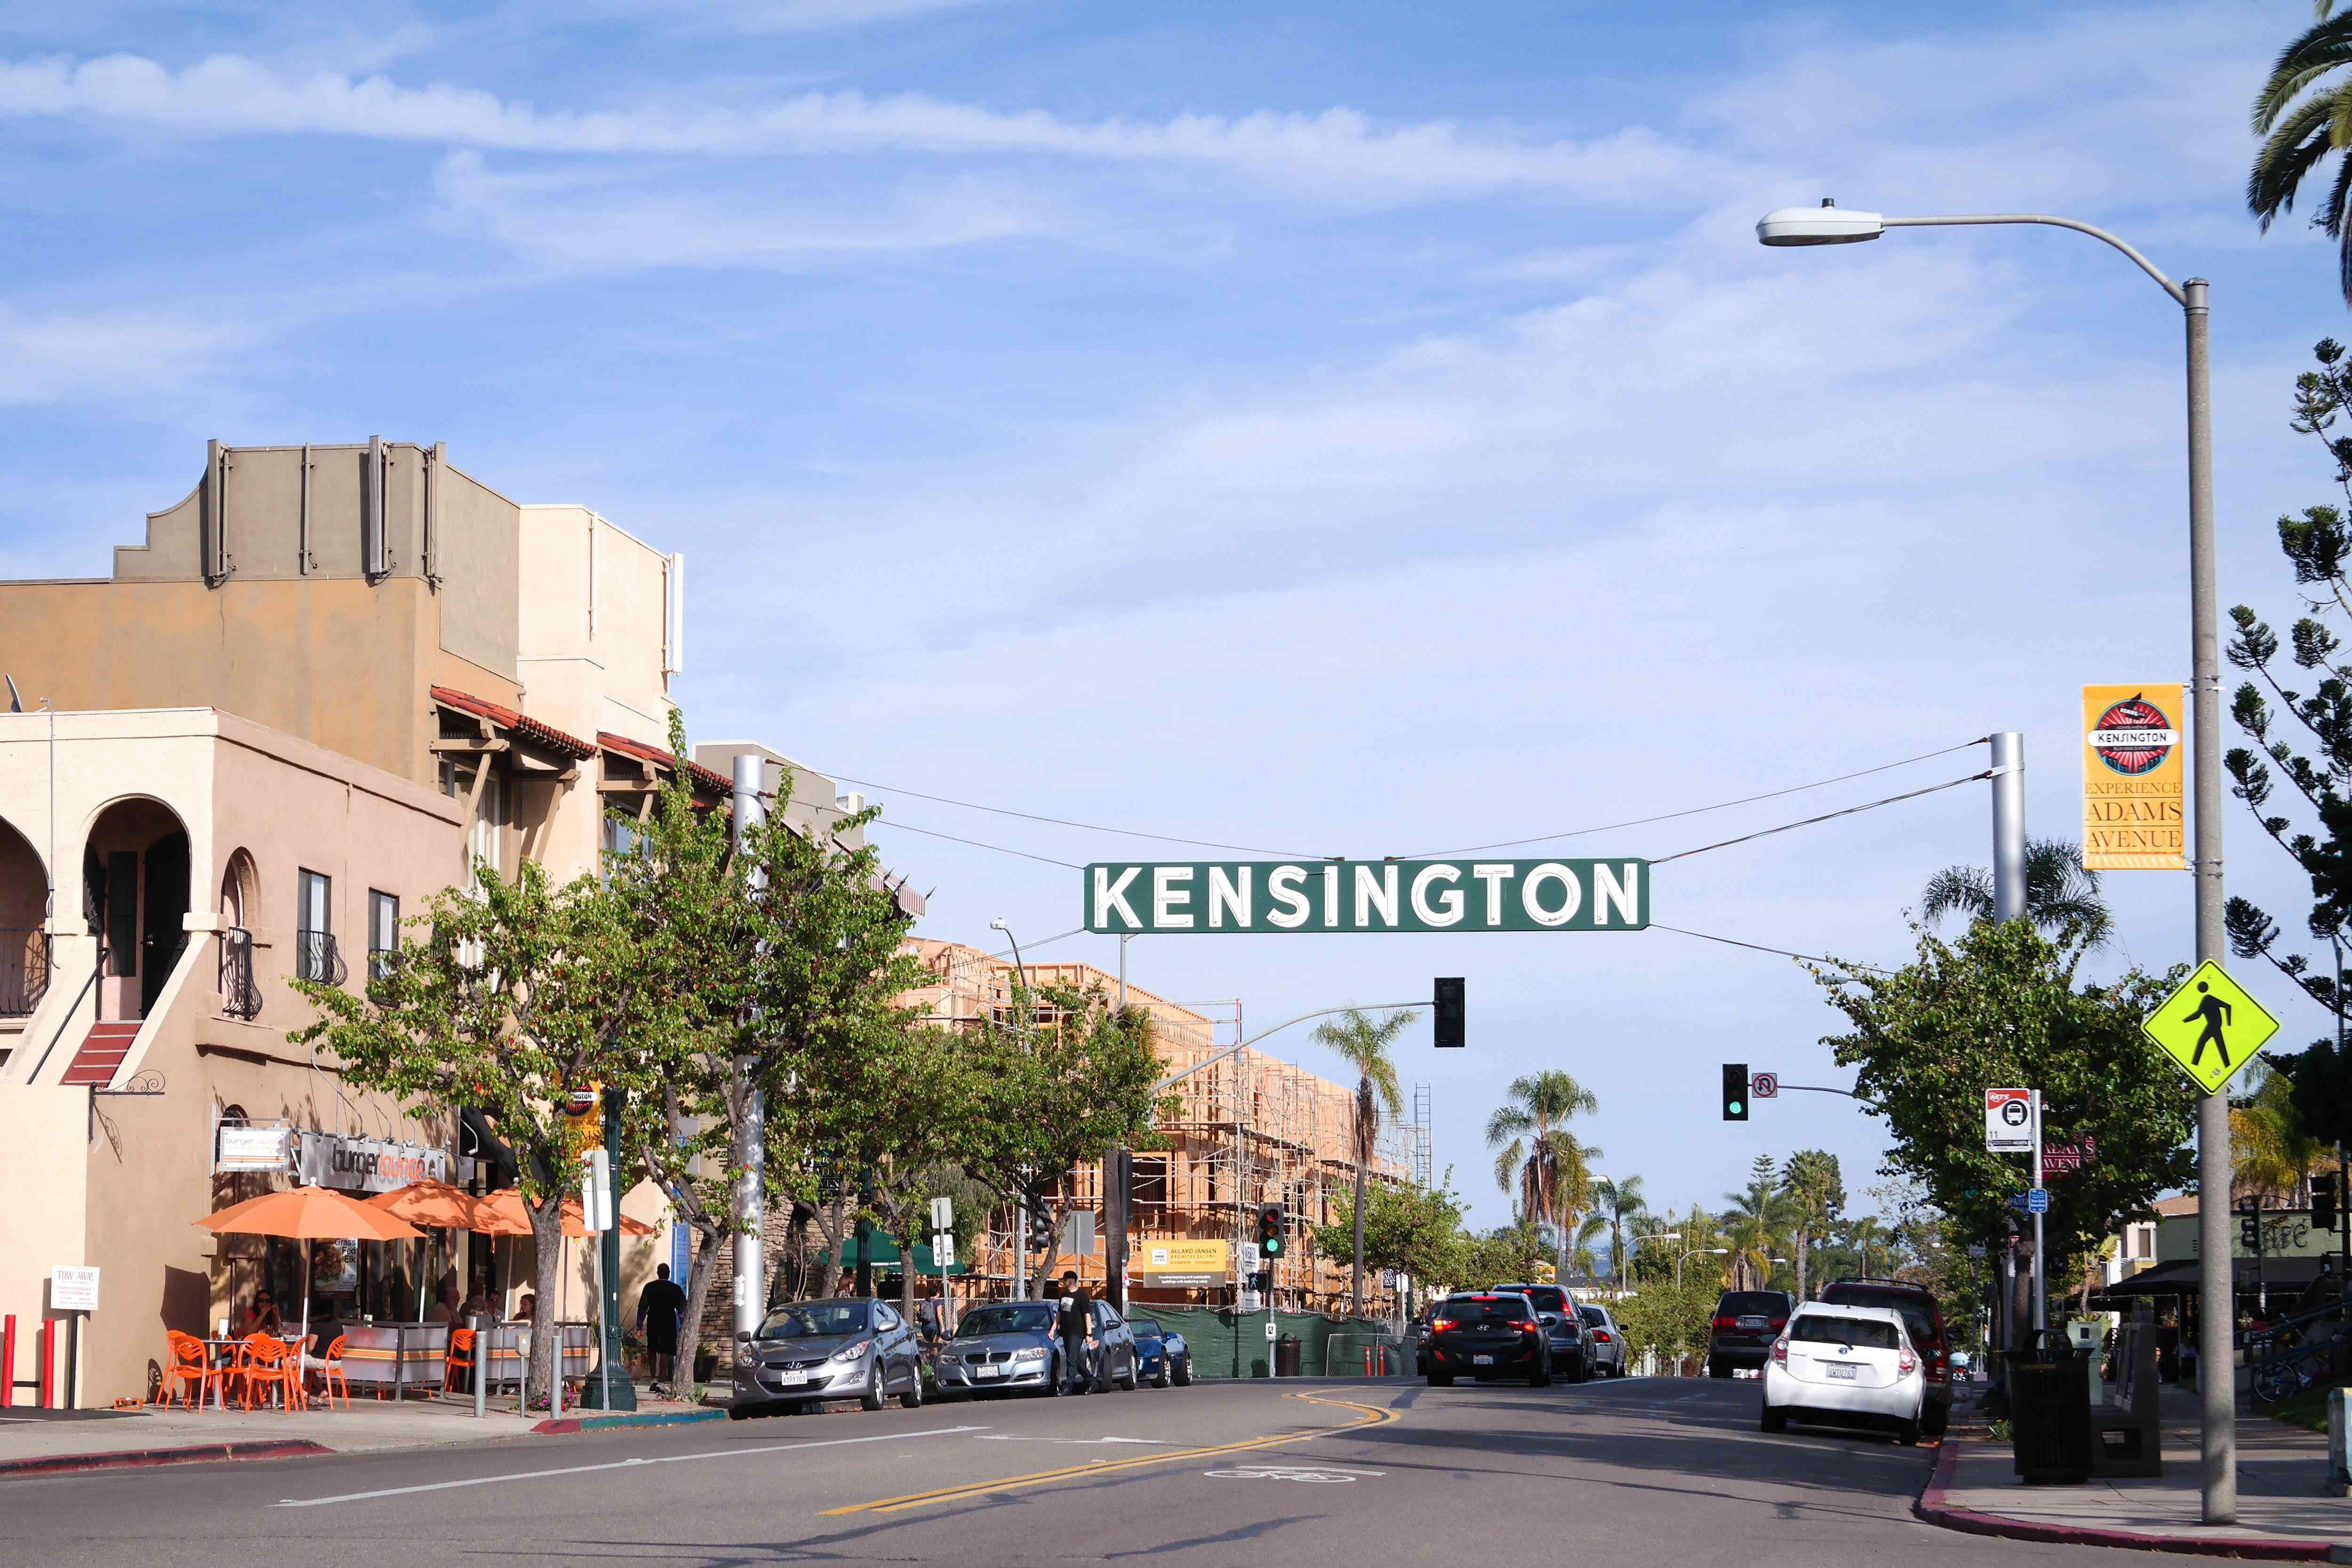 Kensington sign in San Diego